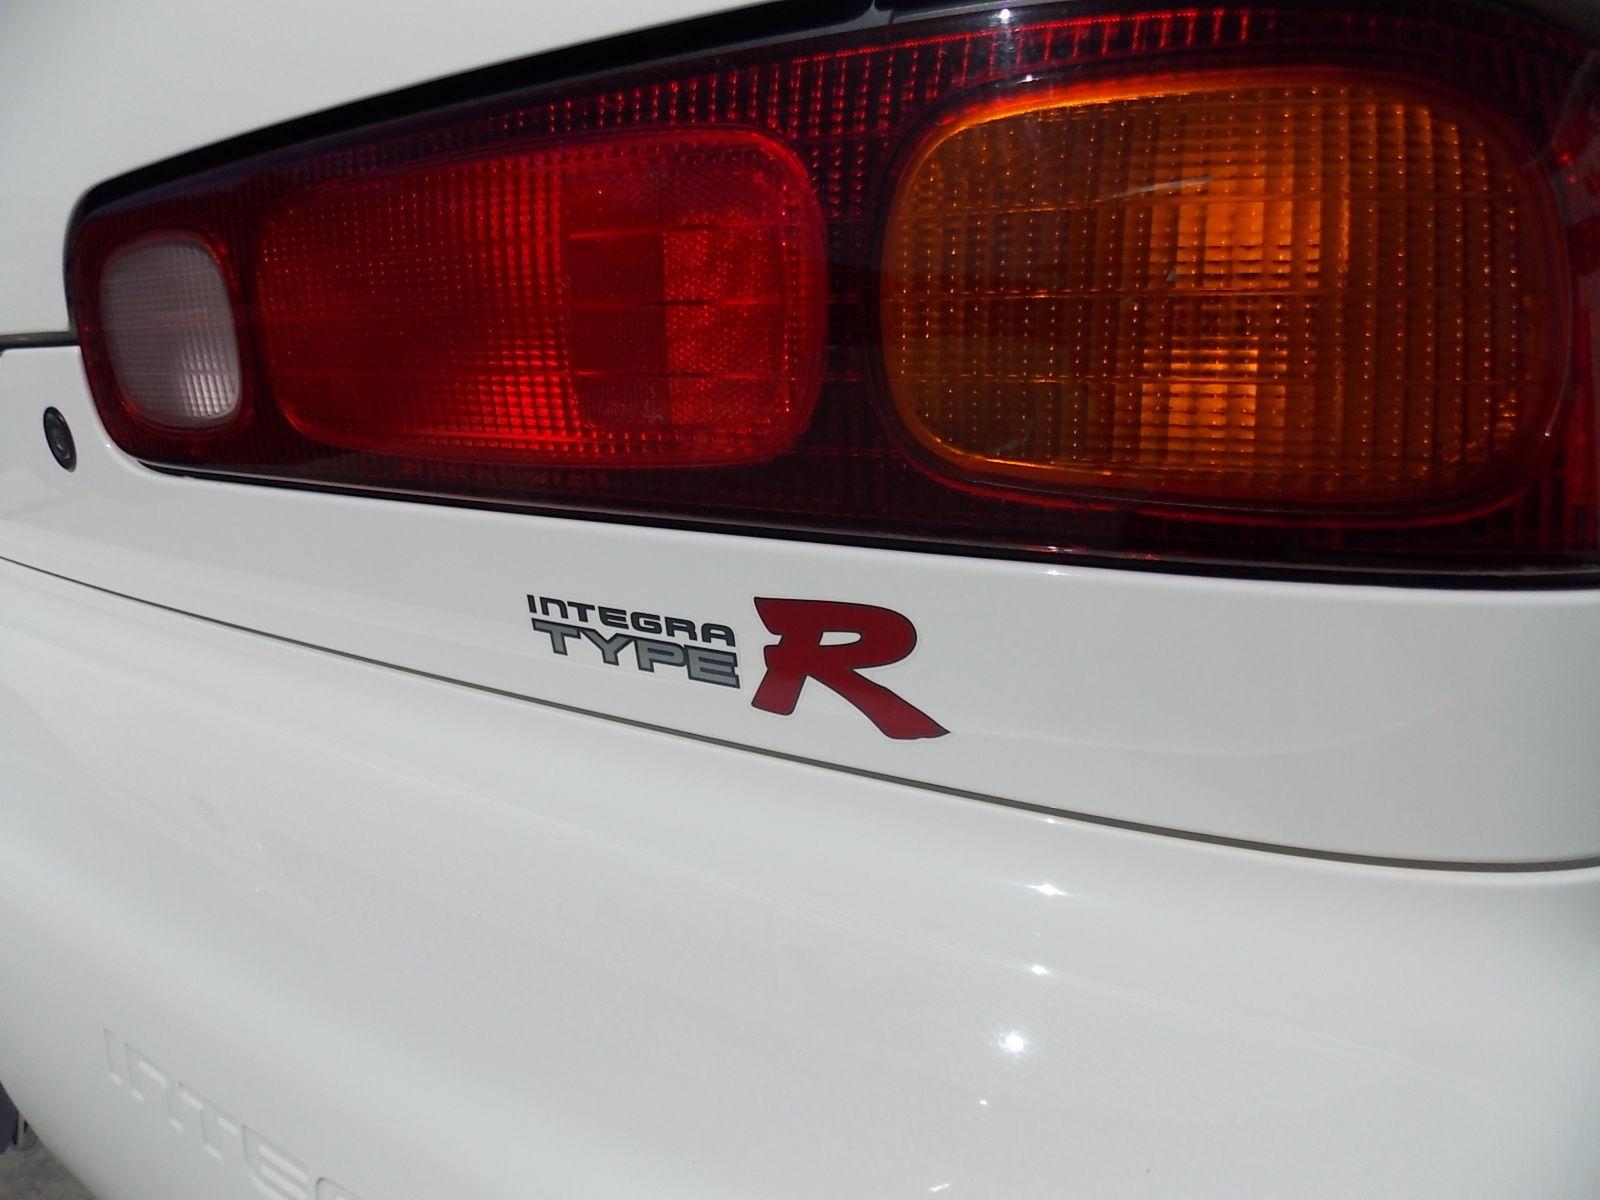 Pristine 1997 Acura Integra Type R Hits 40 000 On Ebay Only 10k Miles